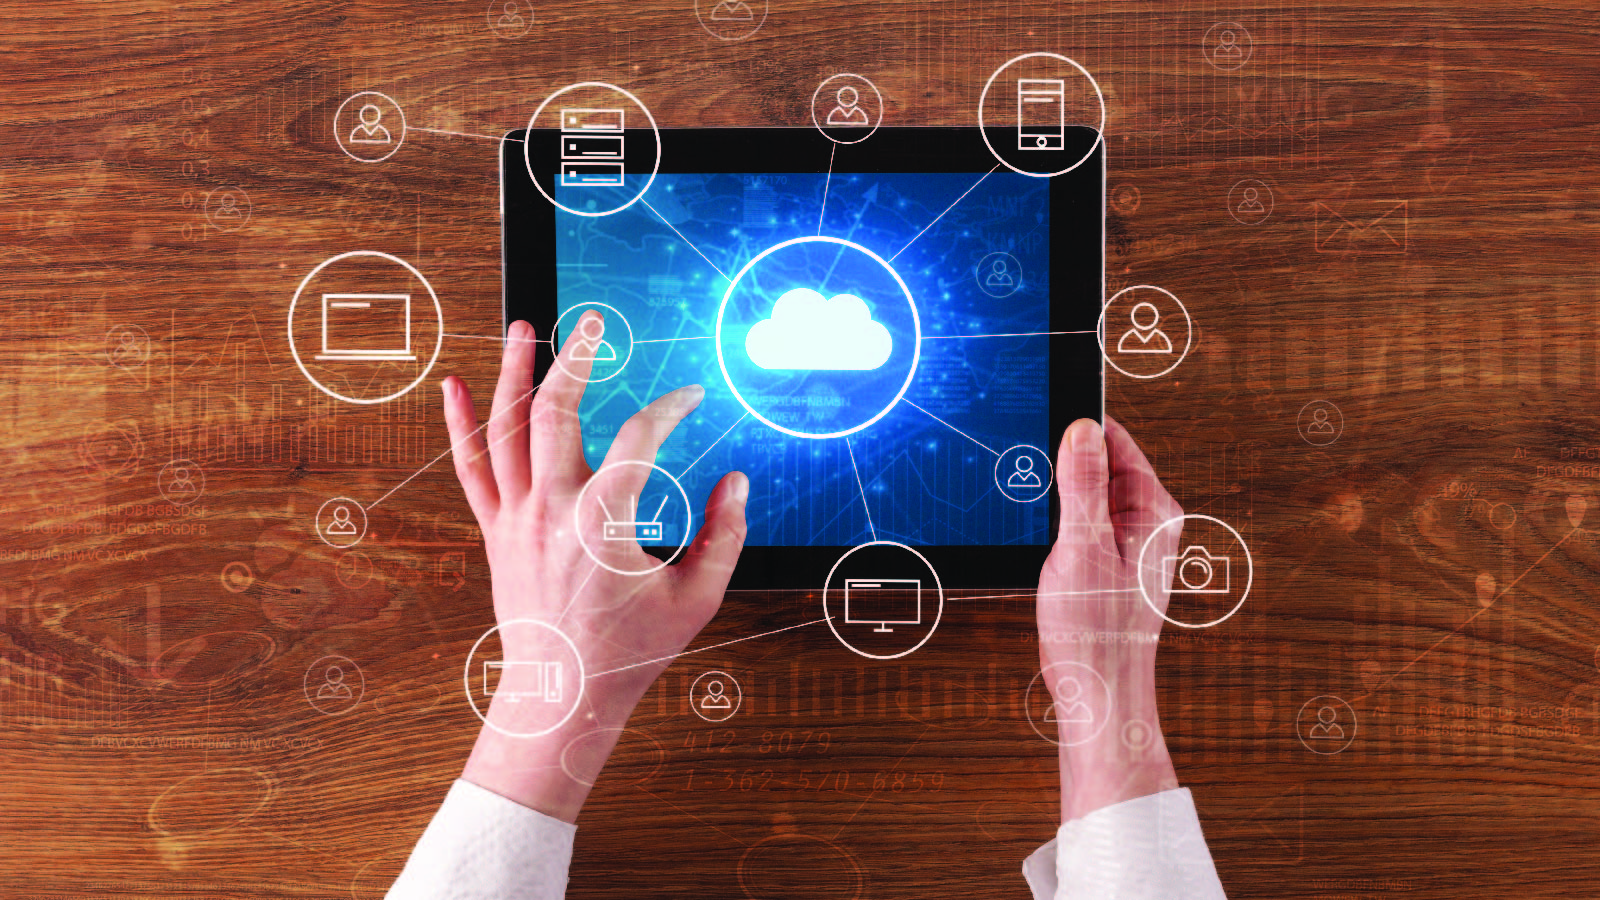 Cloud, Multi-cloud, Multi-database, Cloud Deployment, Kubernetes, PostgreSQL, DBMS MySQL, Percona, AWS CEO, CTO, Cloud, Multi-cloud, Multi-database, Cloud Deployment, Kubernetes